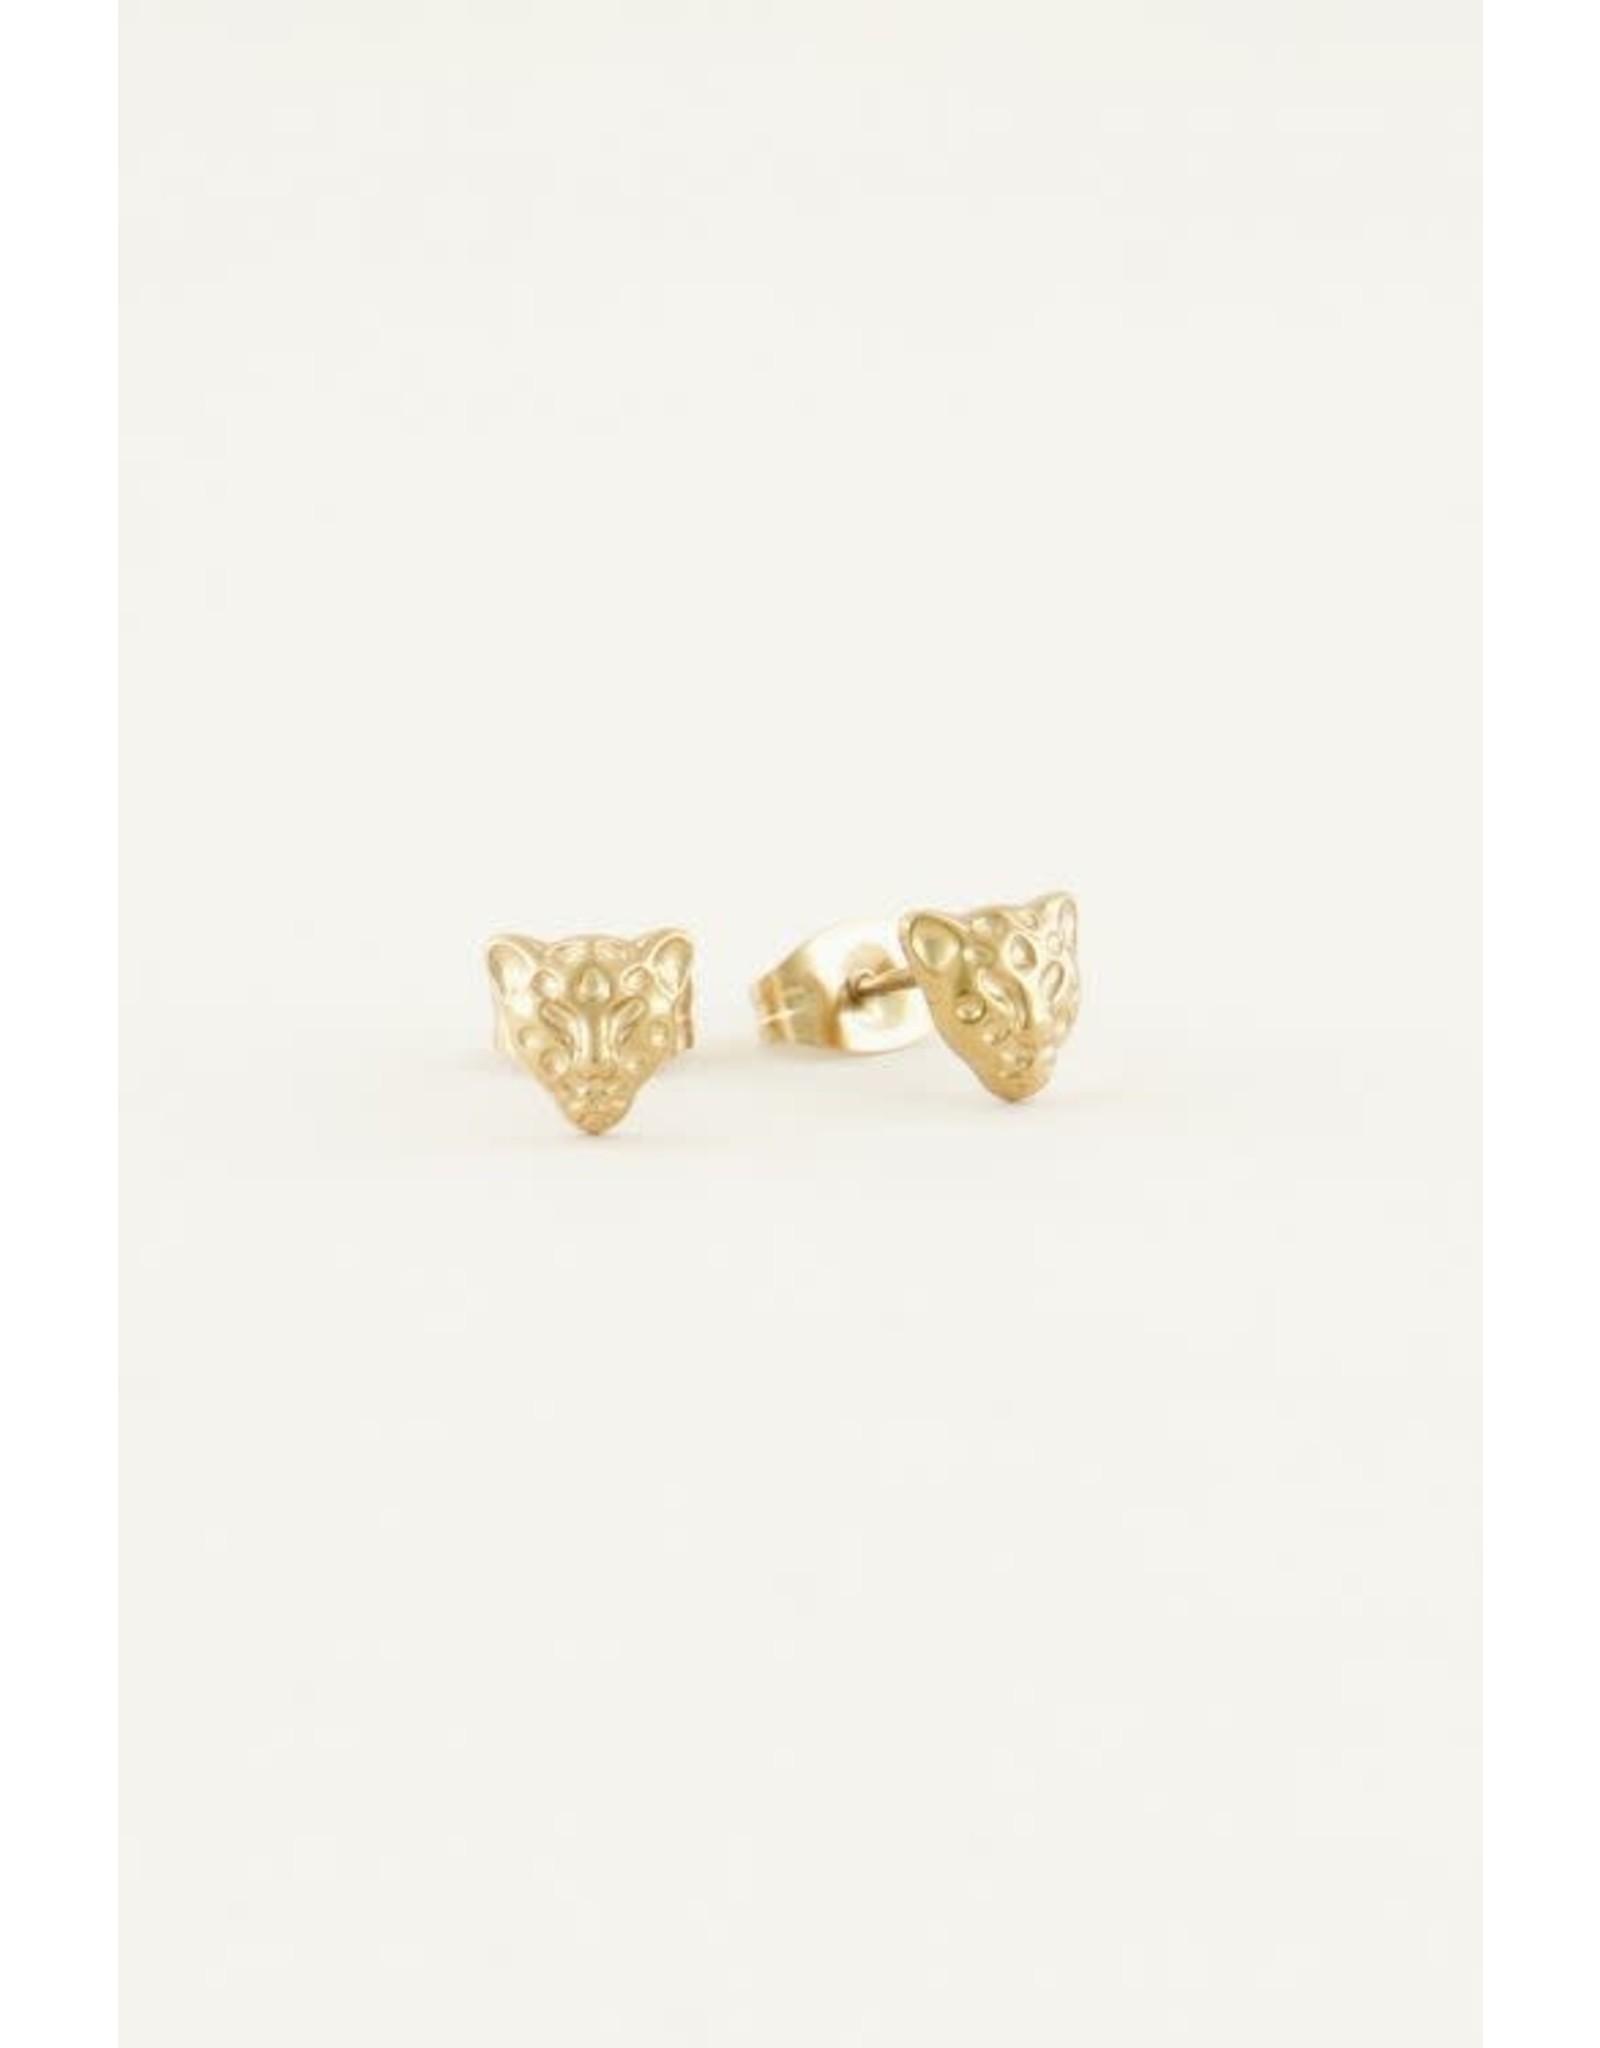 My Jewellery My Jewellery Earstuds - Luipaard